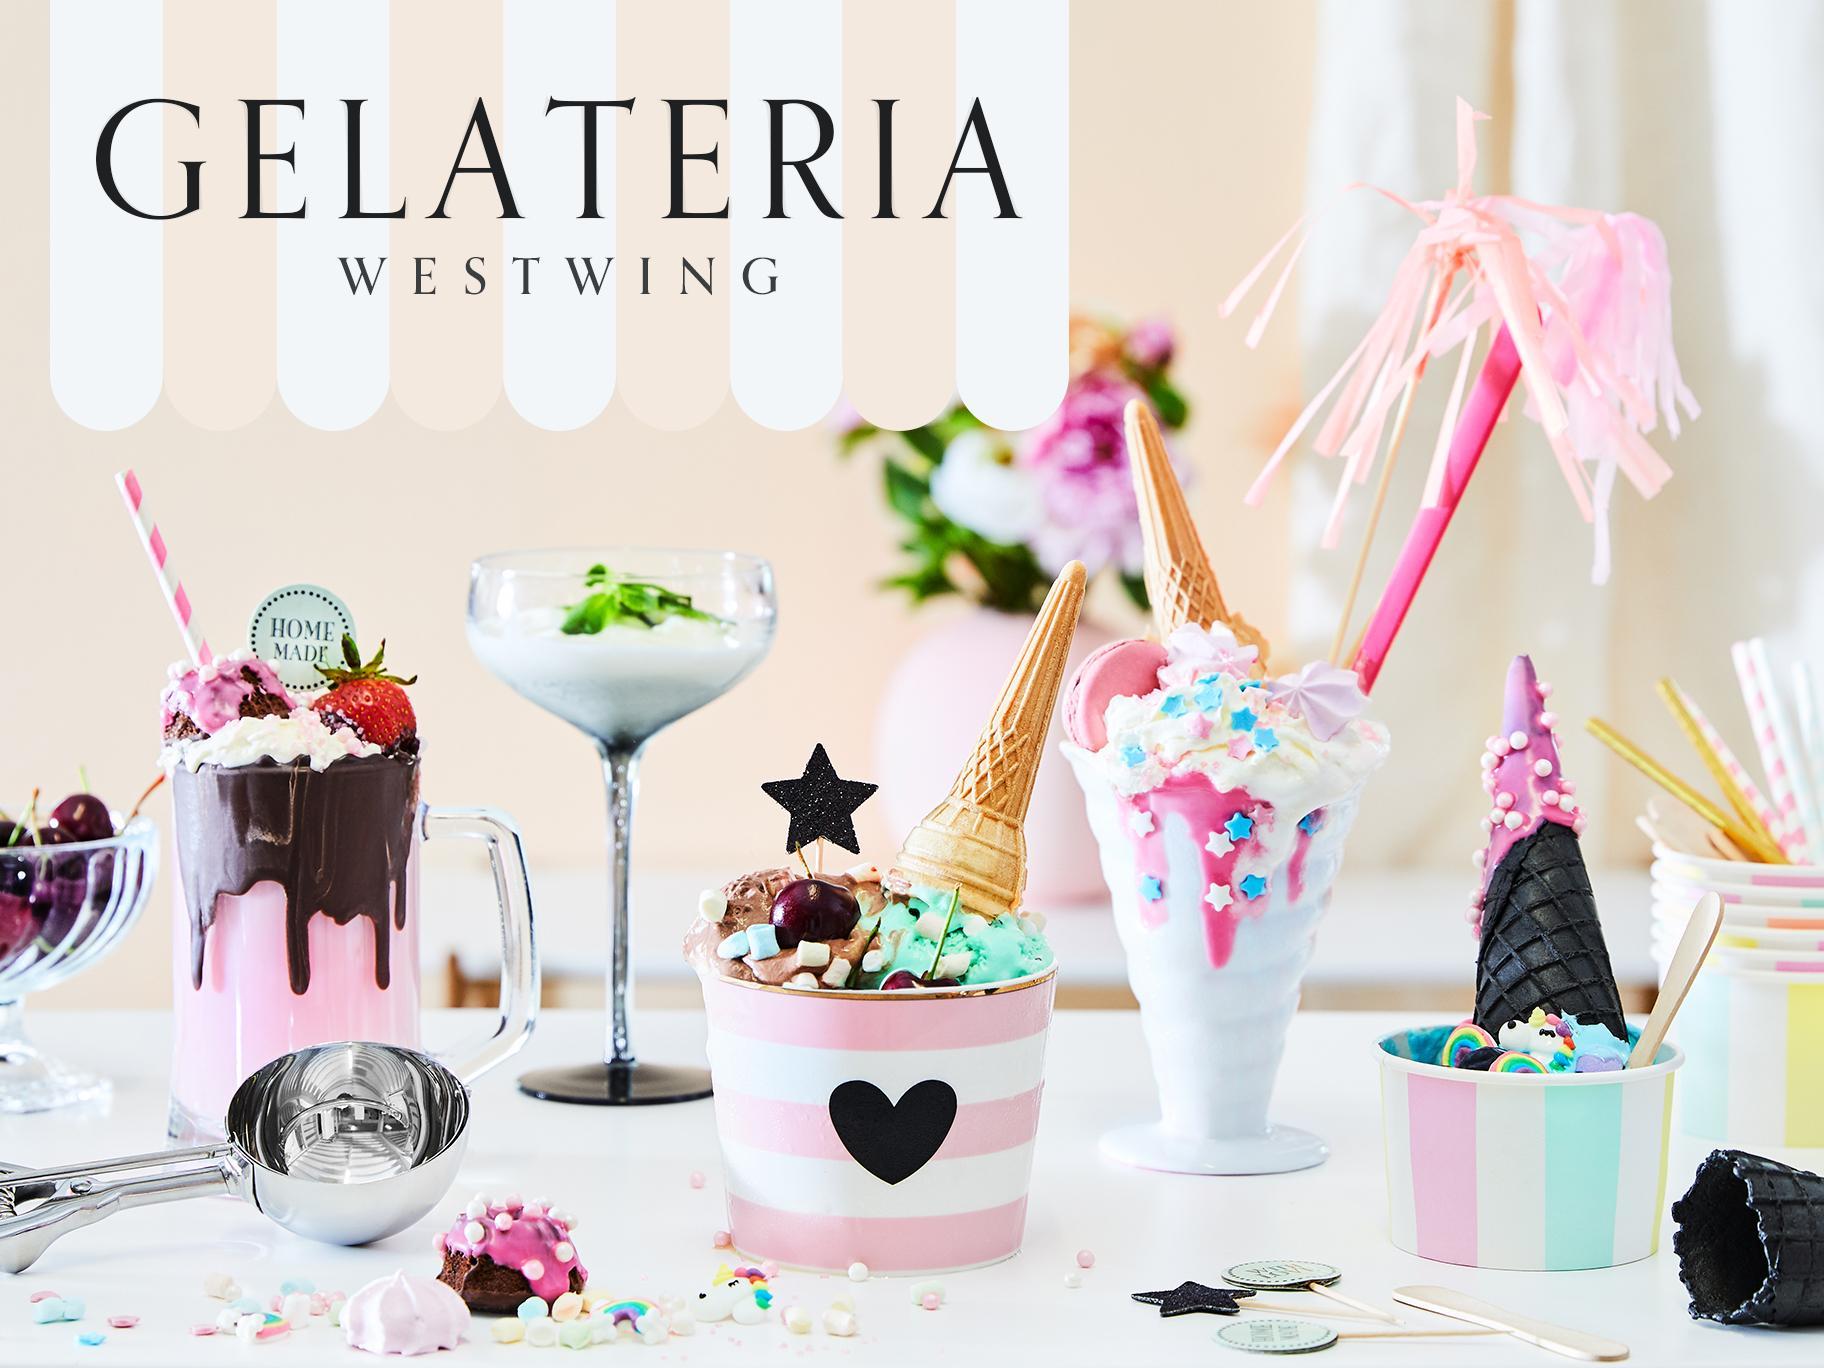 Gelateria Westwing